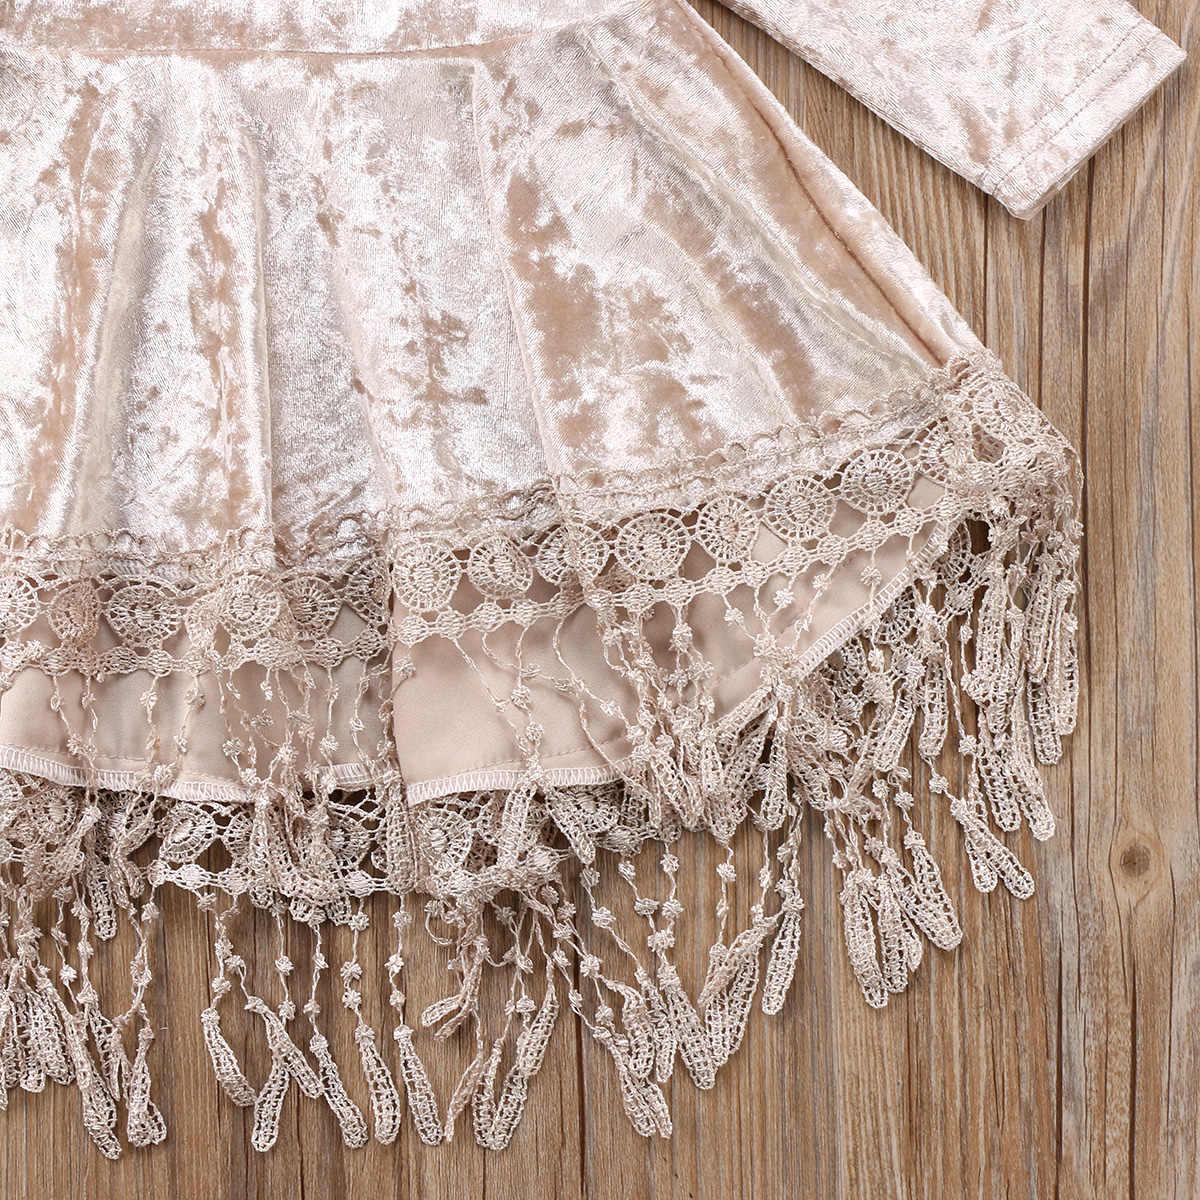 Bebê moda páscoa princesa bebê flor meninas vestido de veludo pageant festa vestido de dama de honra formal